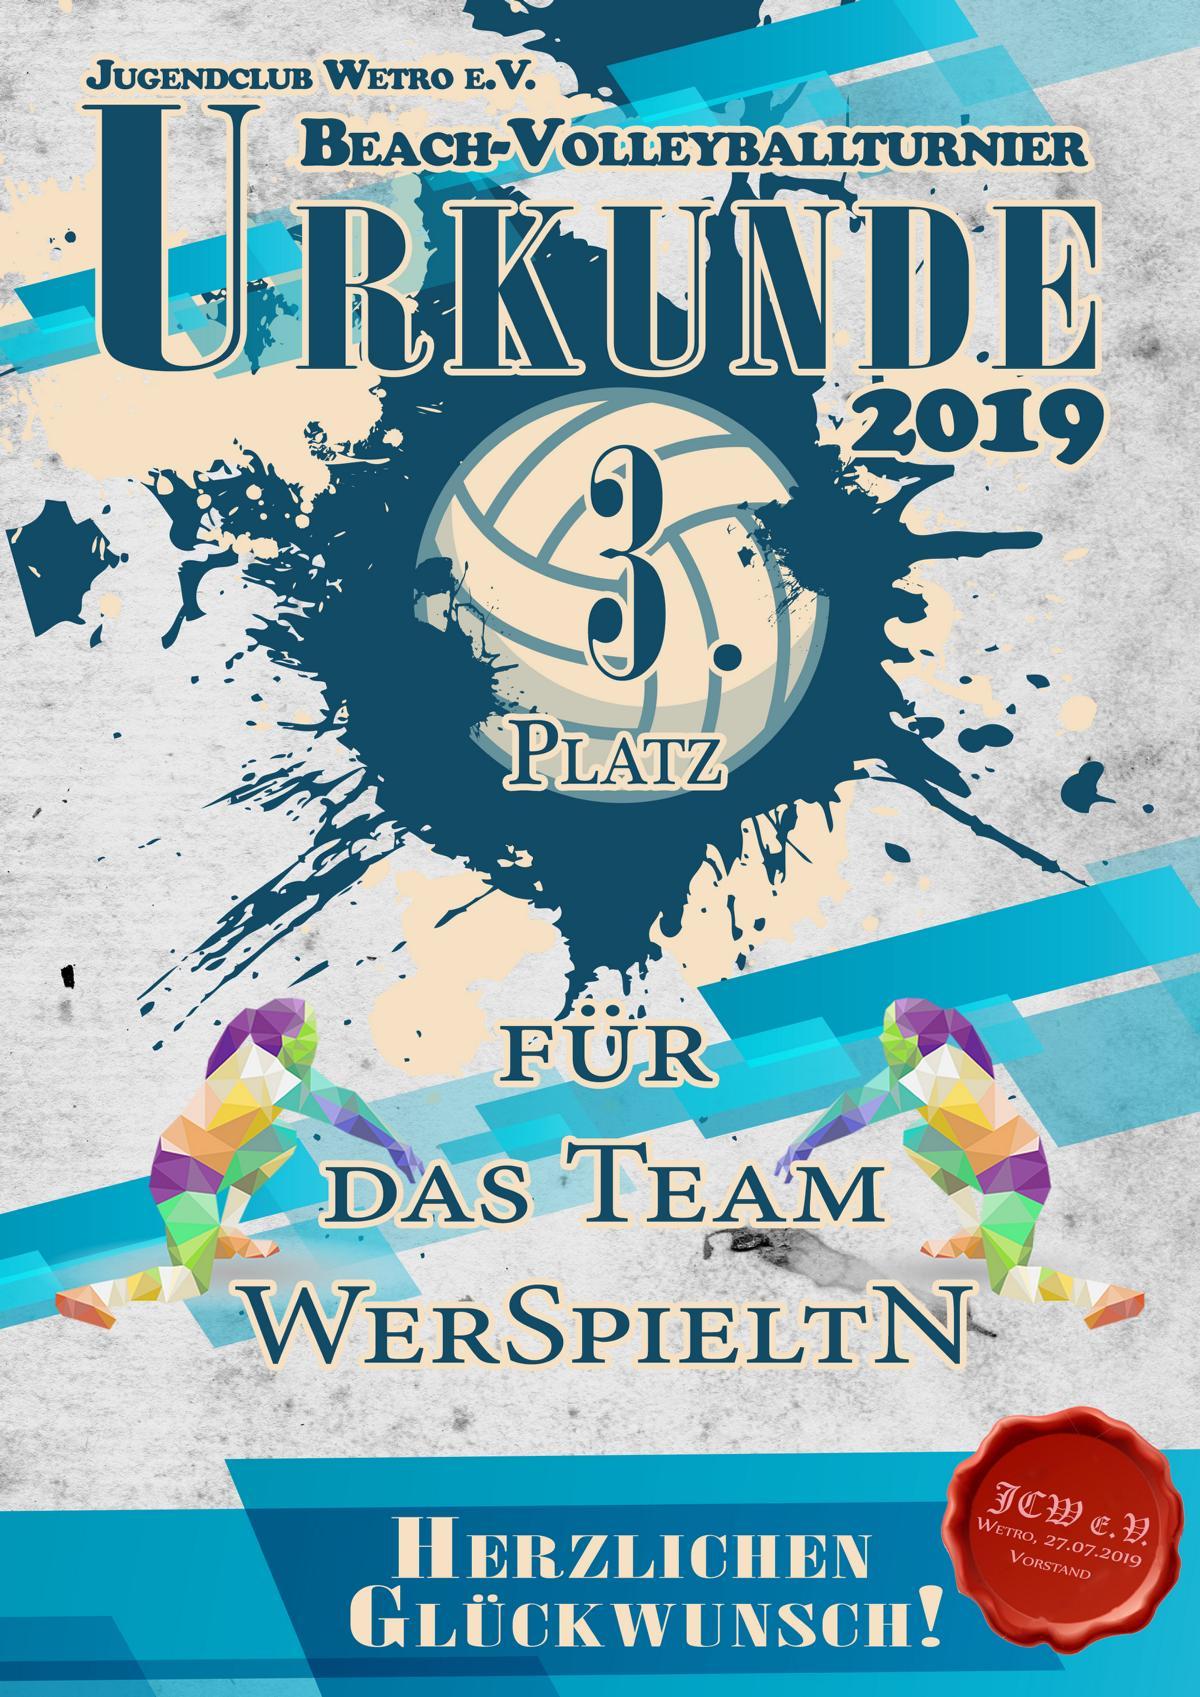 http://www.jugendclub-wetro.de/wp-content/uploads/2019/07/03_VBT2k19_Wersp.jpg